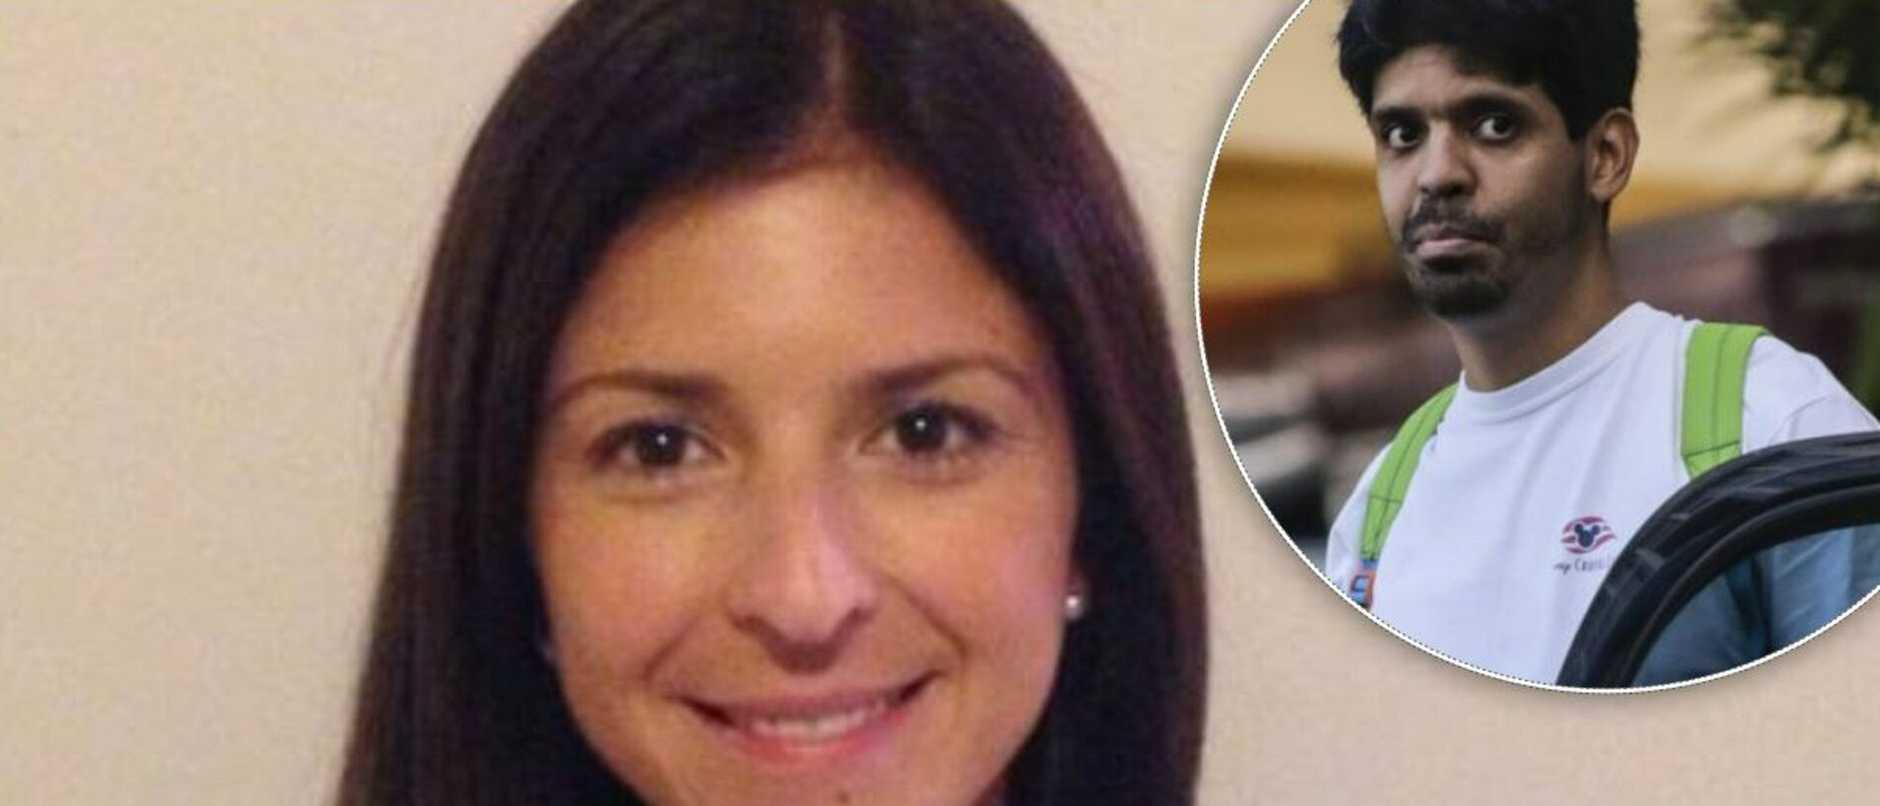 CECILIA HADDAD'S KILLER IS APPEALING FOR PAROLE